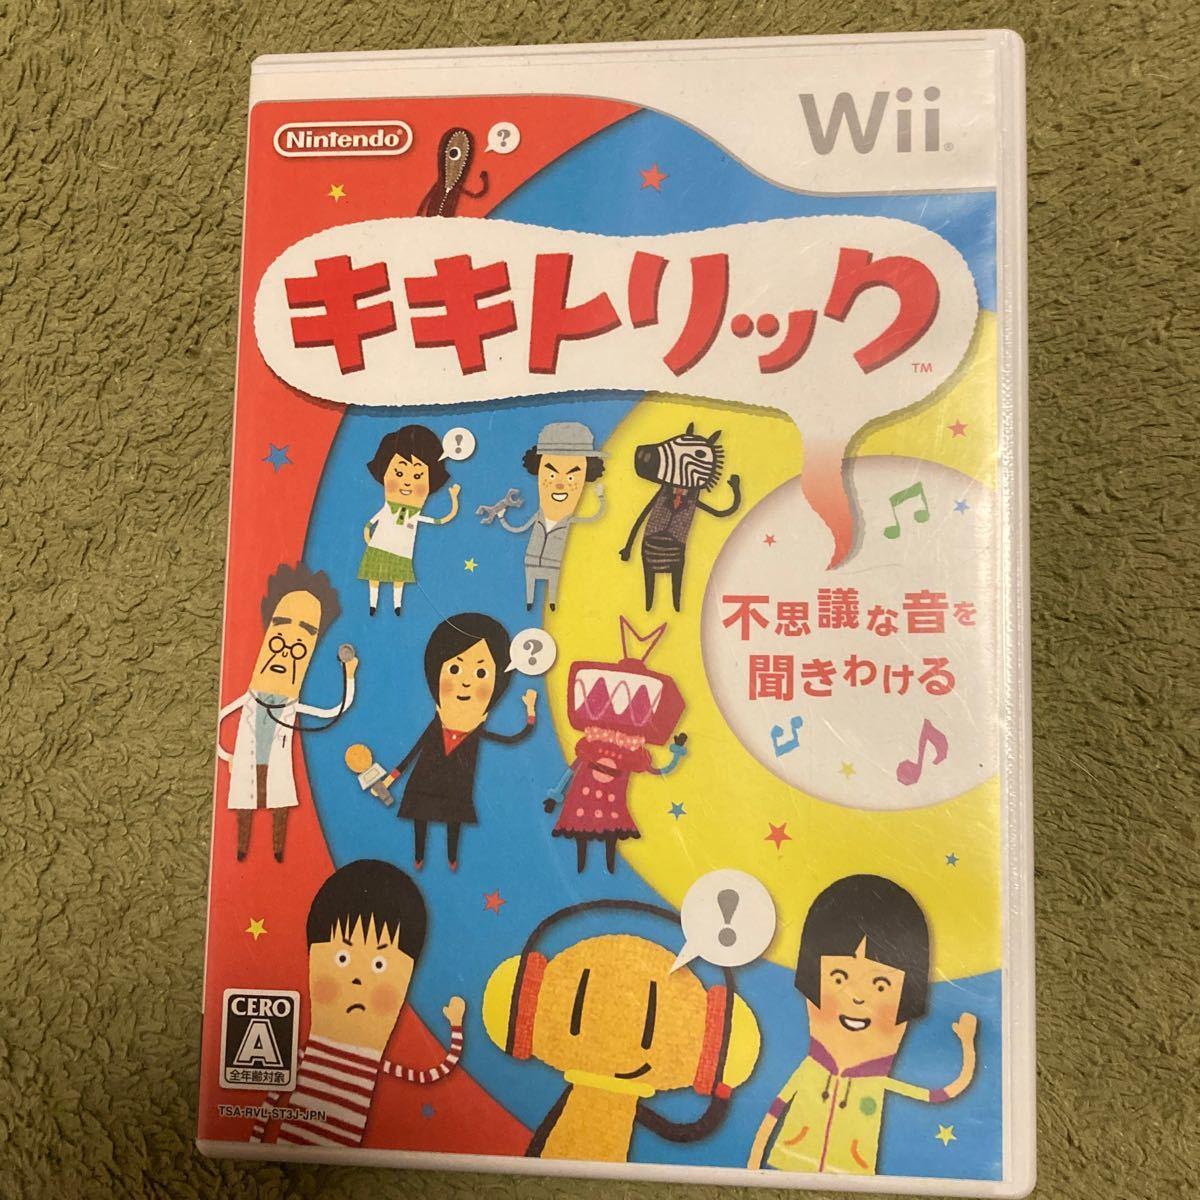 Wii Wiiソフト キキトリック Wii ソフト、任天堂 Nintendo ニンテンドー